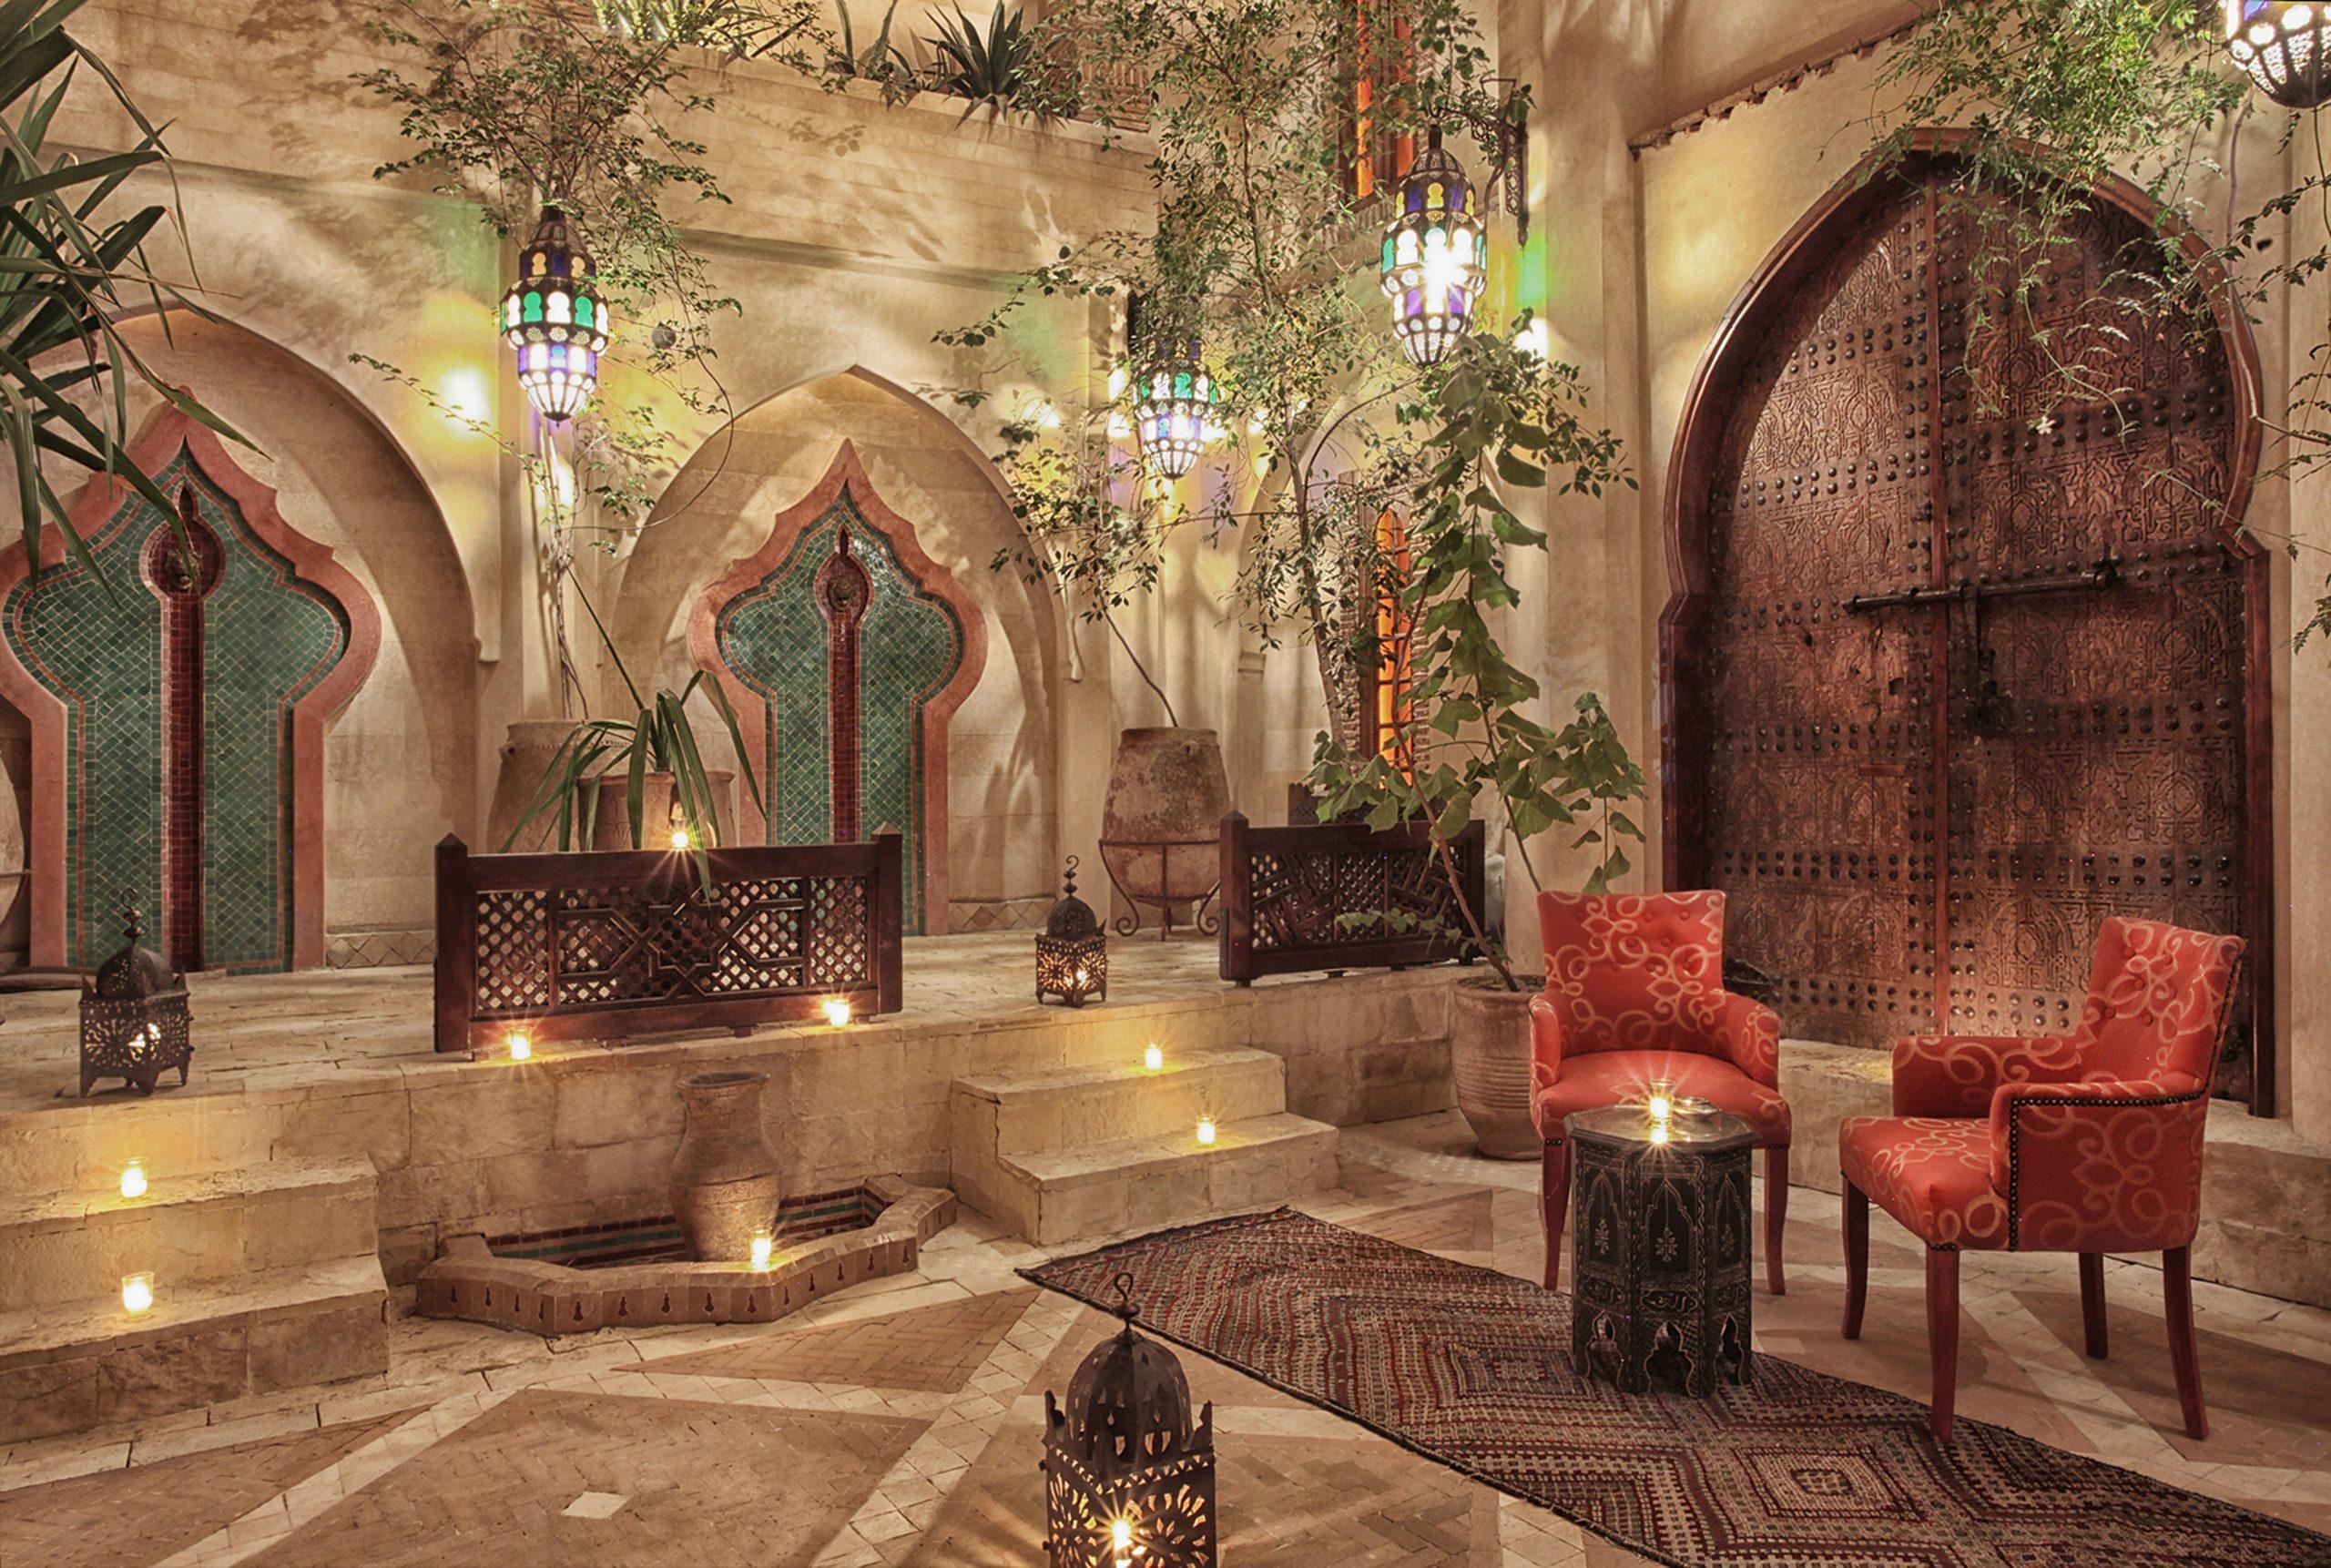 La maison arabe, The Moroccan Restaurant, Marrakech.